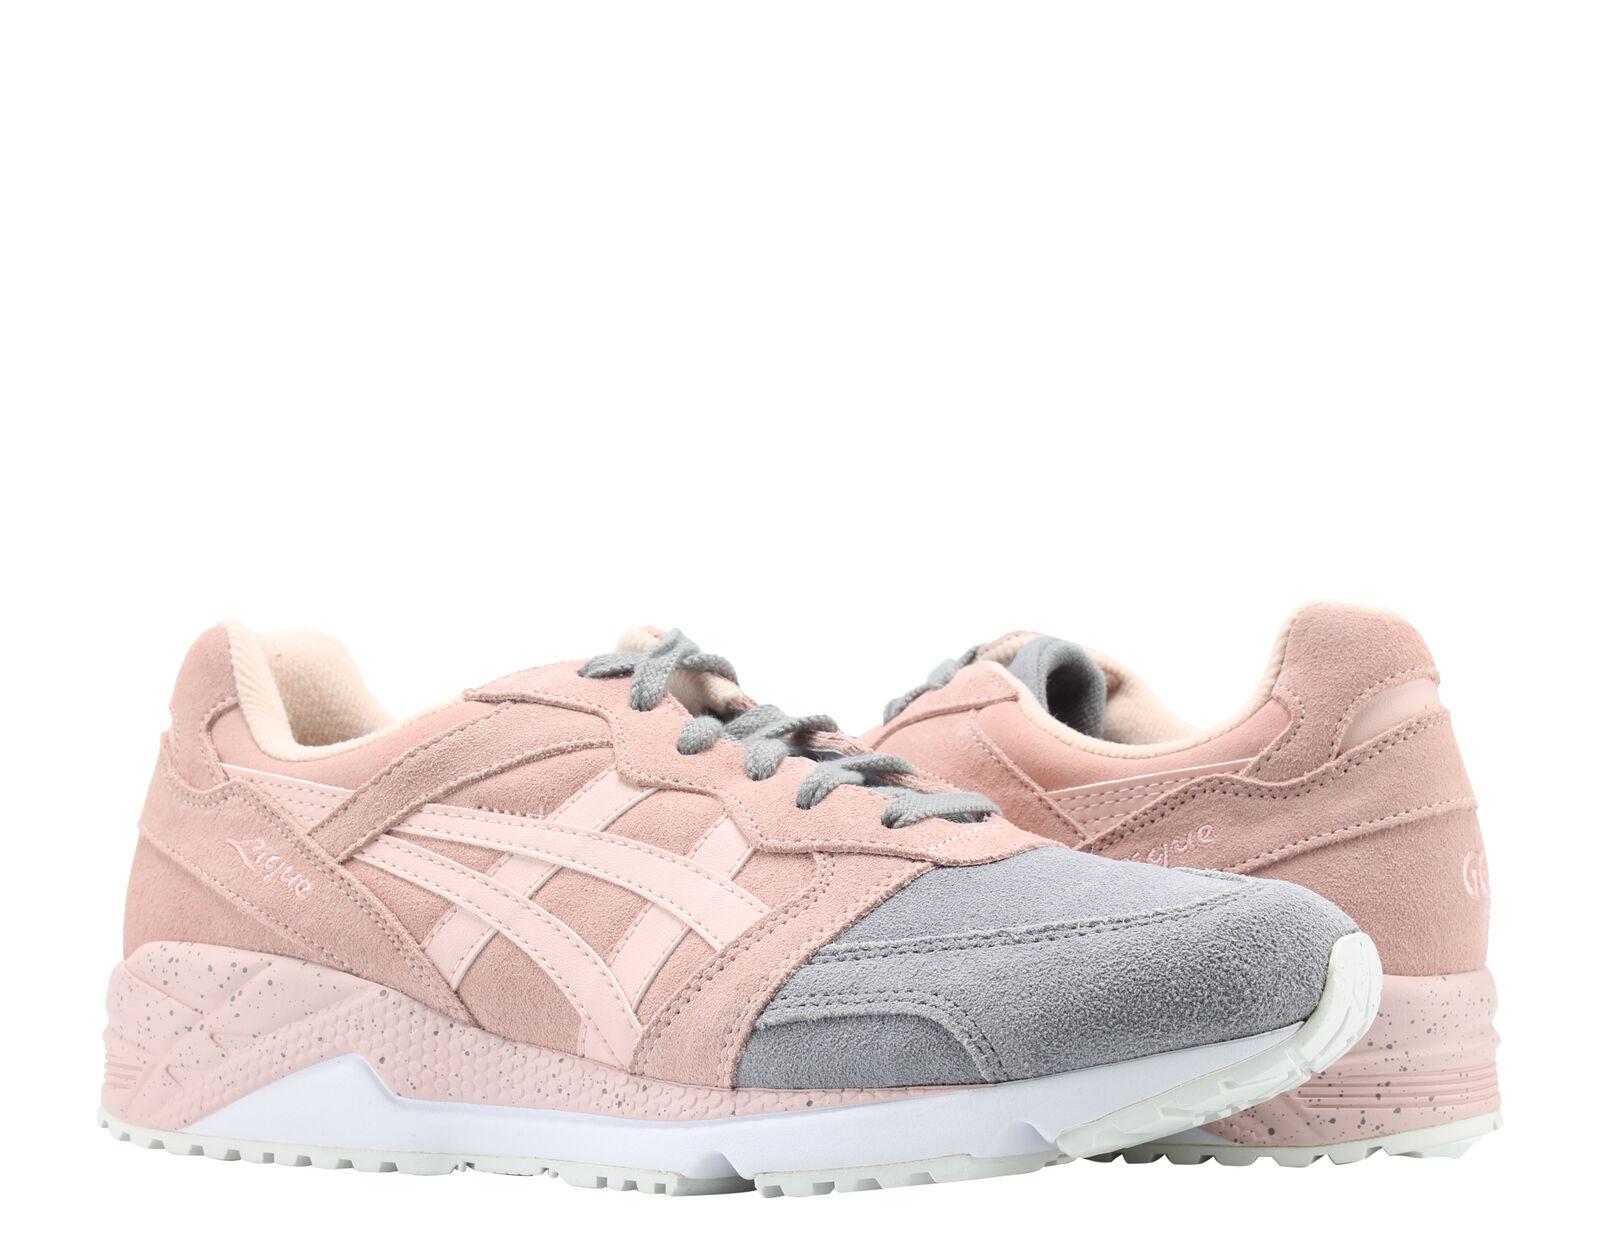 Asics Gel-Lique Aluminum Evening Sand Men's Running shoes HL7N2-9617